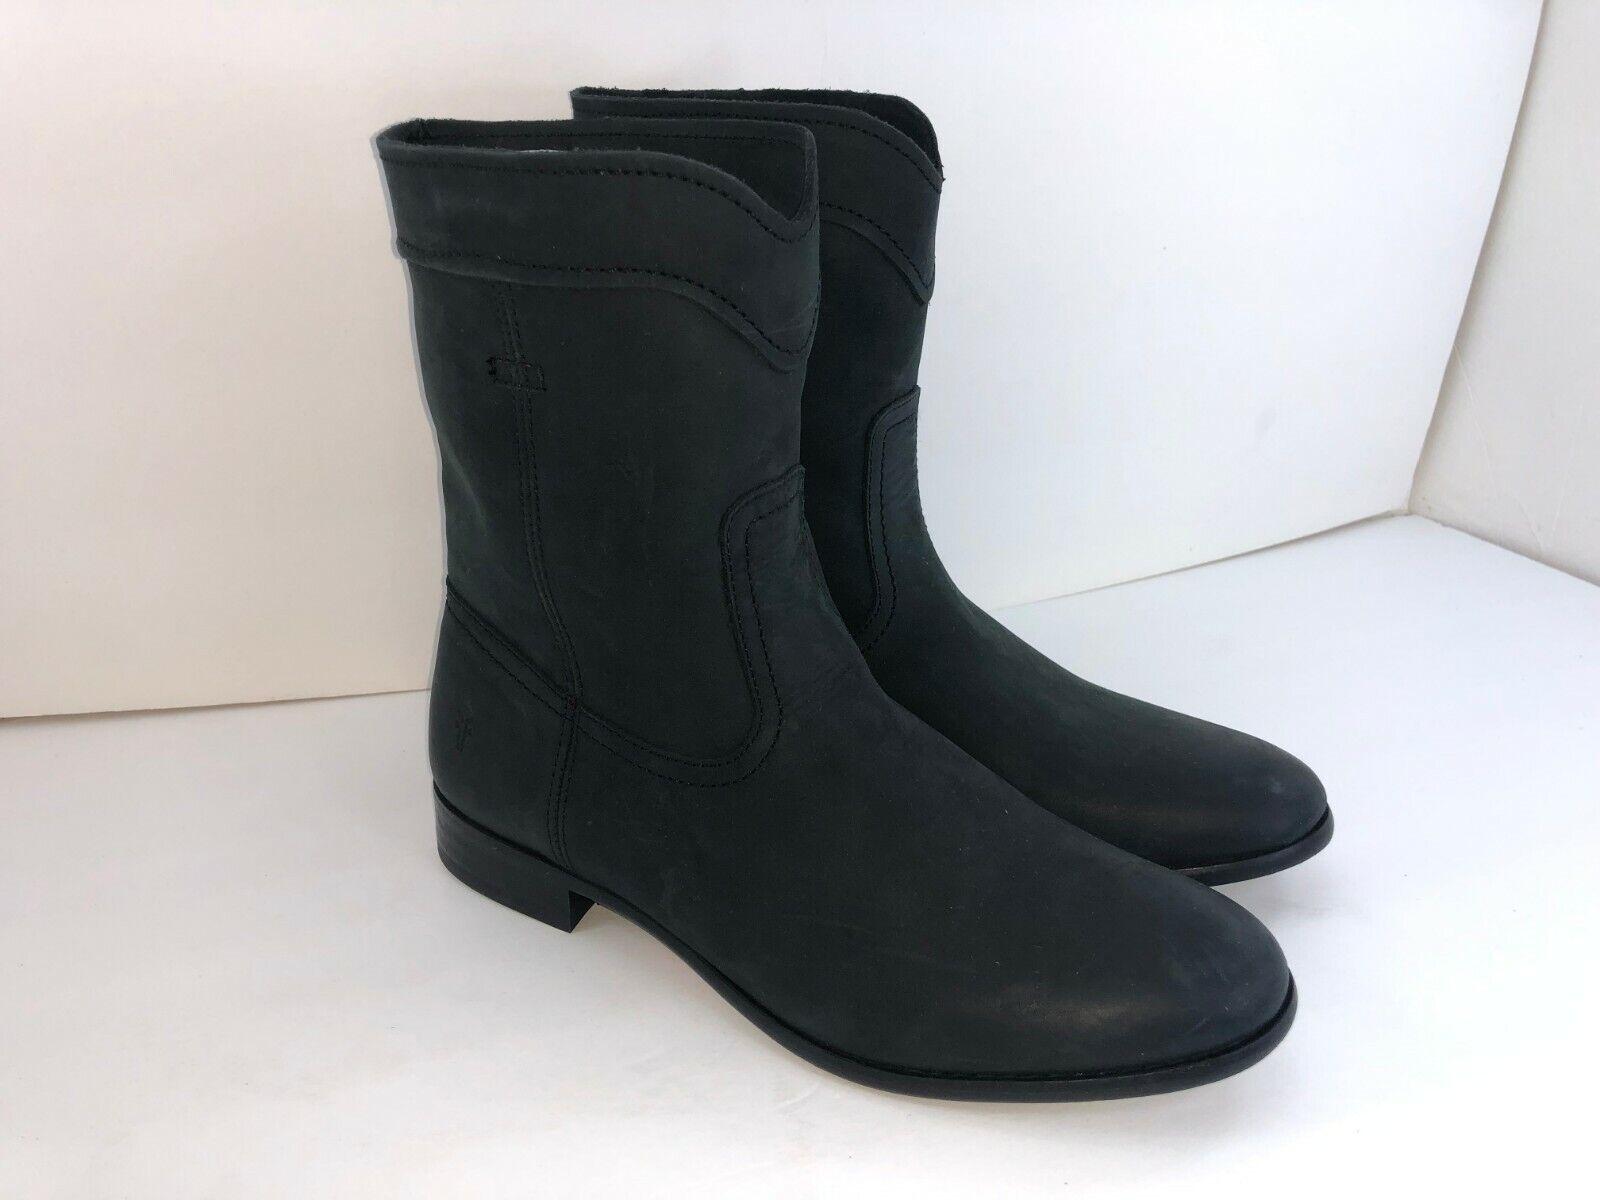 Frye Cara Roper Womens Short Leather Boots Black SIZE 7 NWOB  2